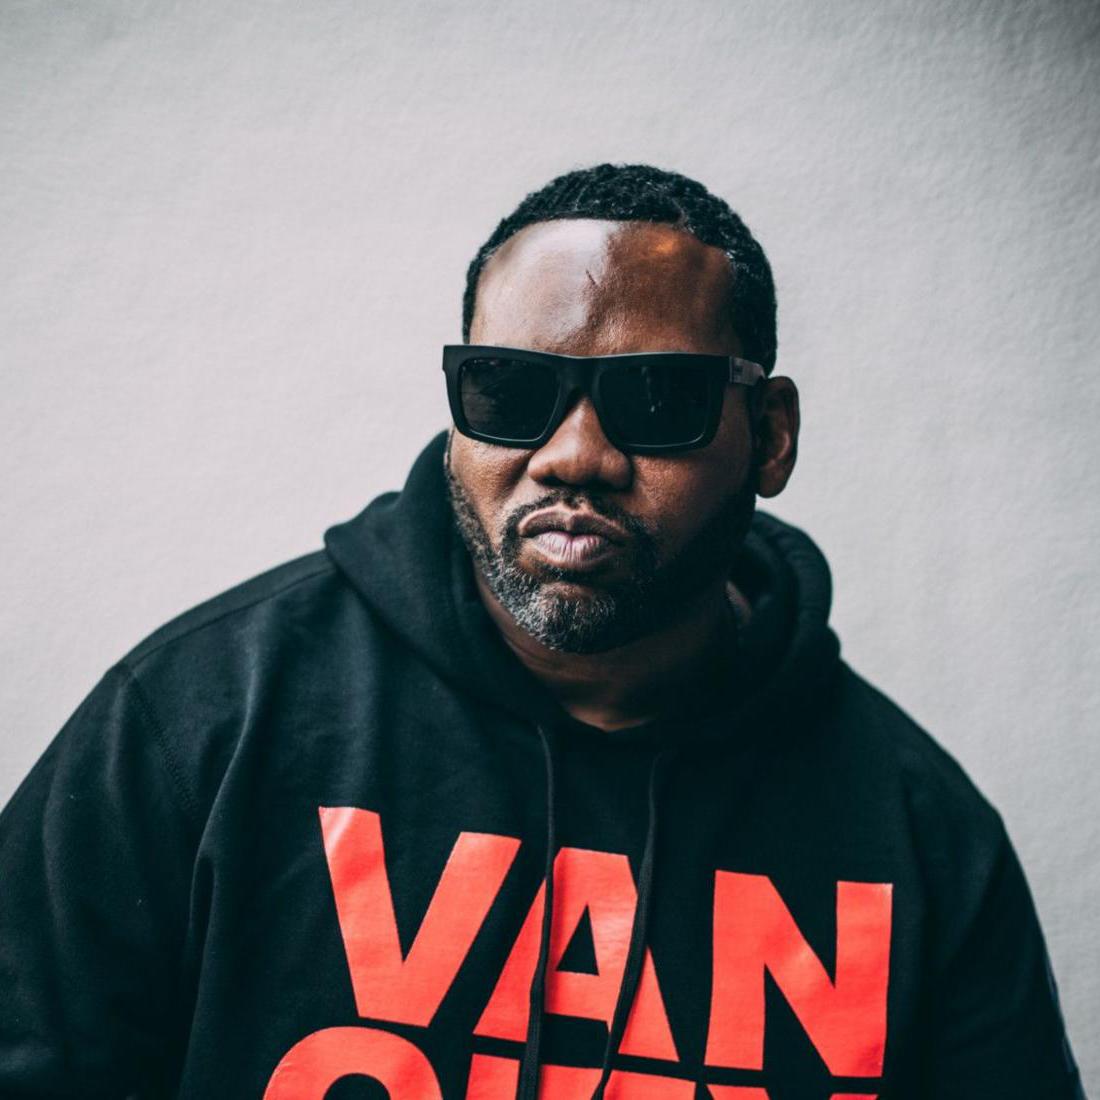 Headshot of hip-hop artist Raekwon